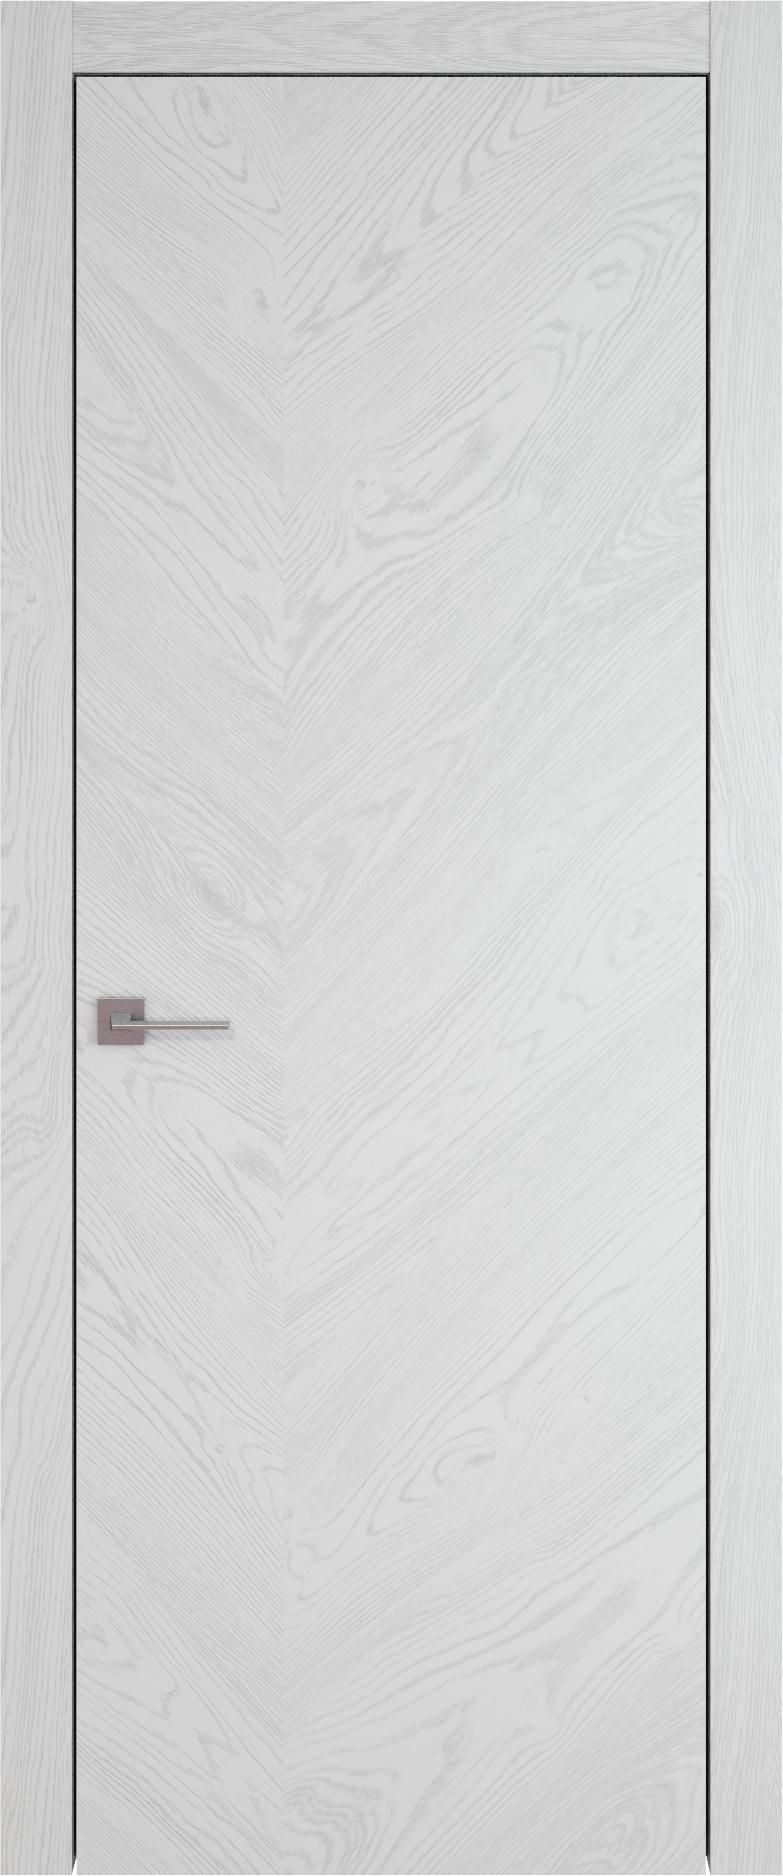 Tivoli Л-1 цвет - Белый ясень (шпон) Без стекла (ДГ)